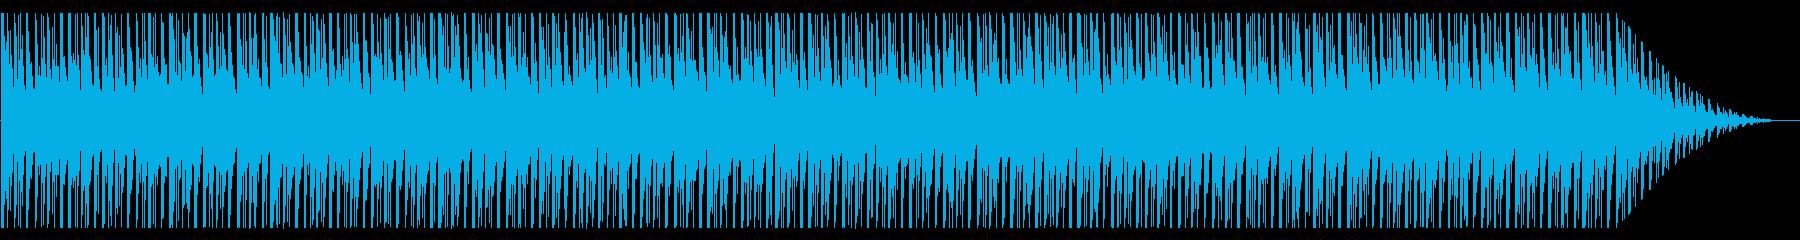 BGMに最適なエレクトロの再生済みの波形